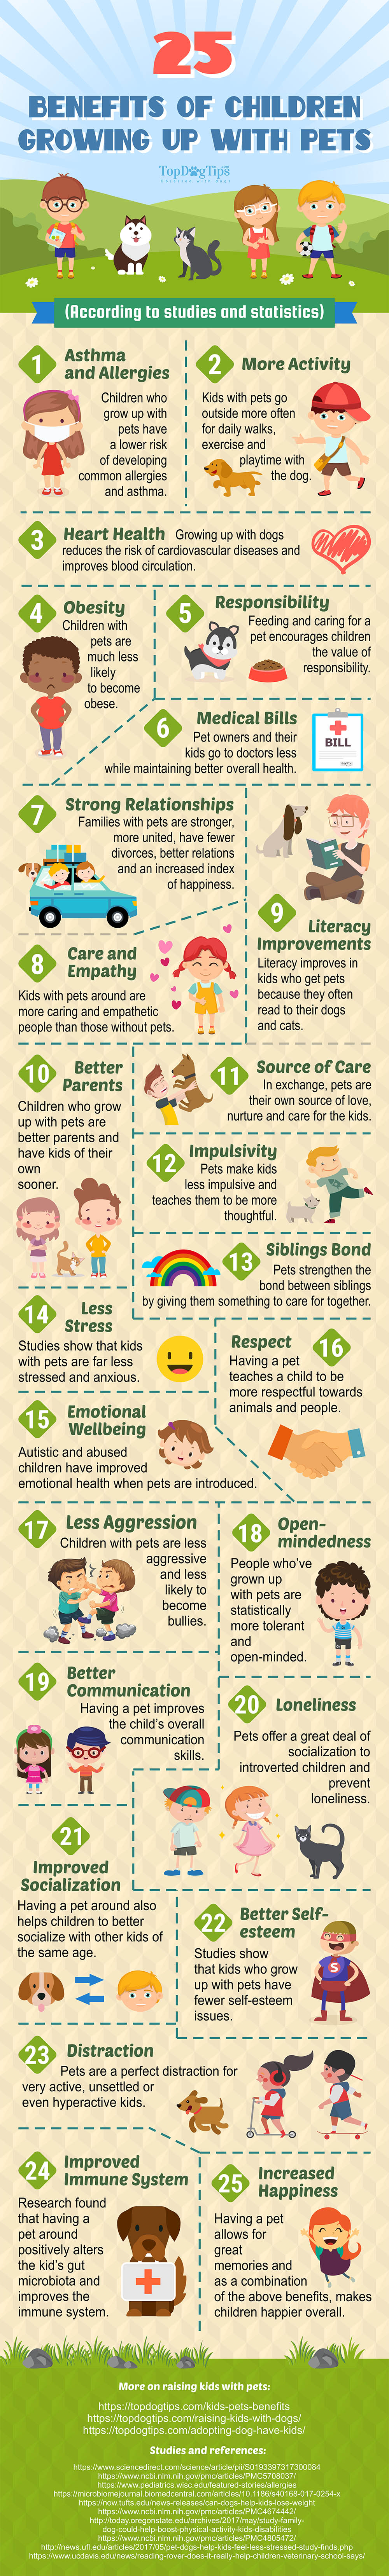 Pets-Kids-Benefits